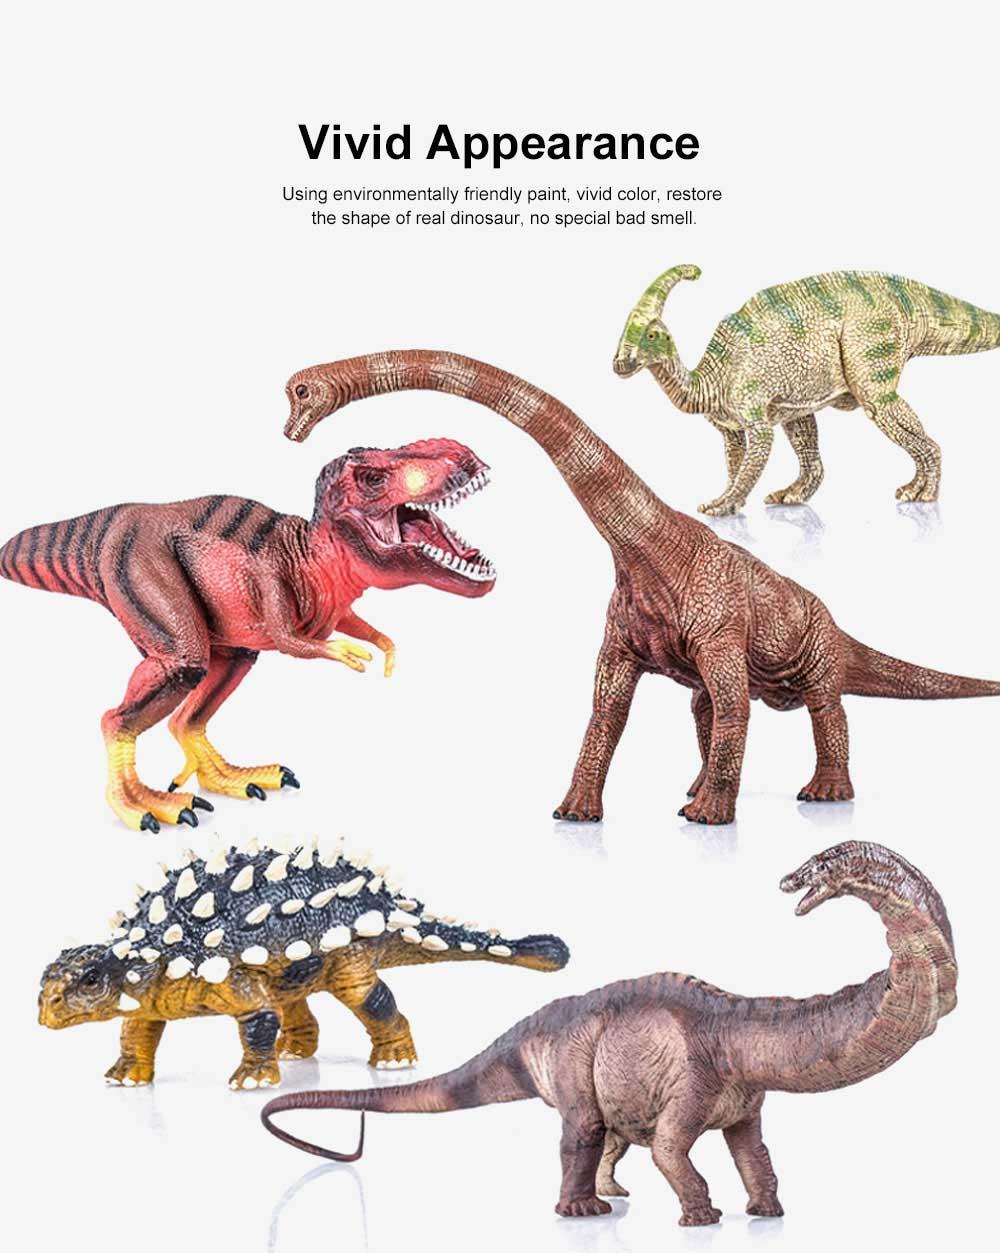 Simulation Dinosaur Toy Solid, No Stitching PVC Dinosaur Model, Educational Realistic Dinosaur Figure Tyrannosaurus Rex 2